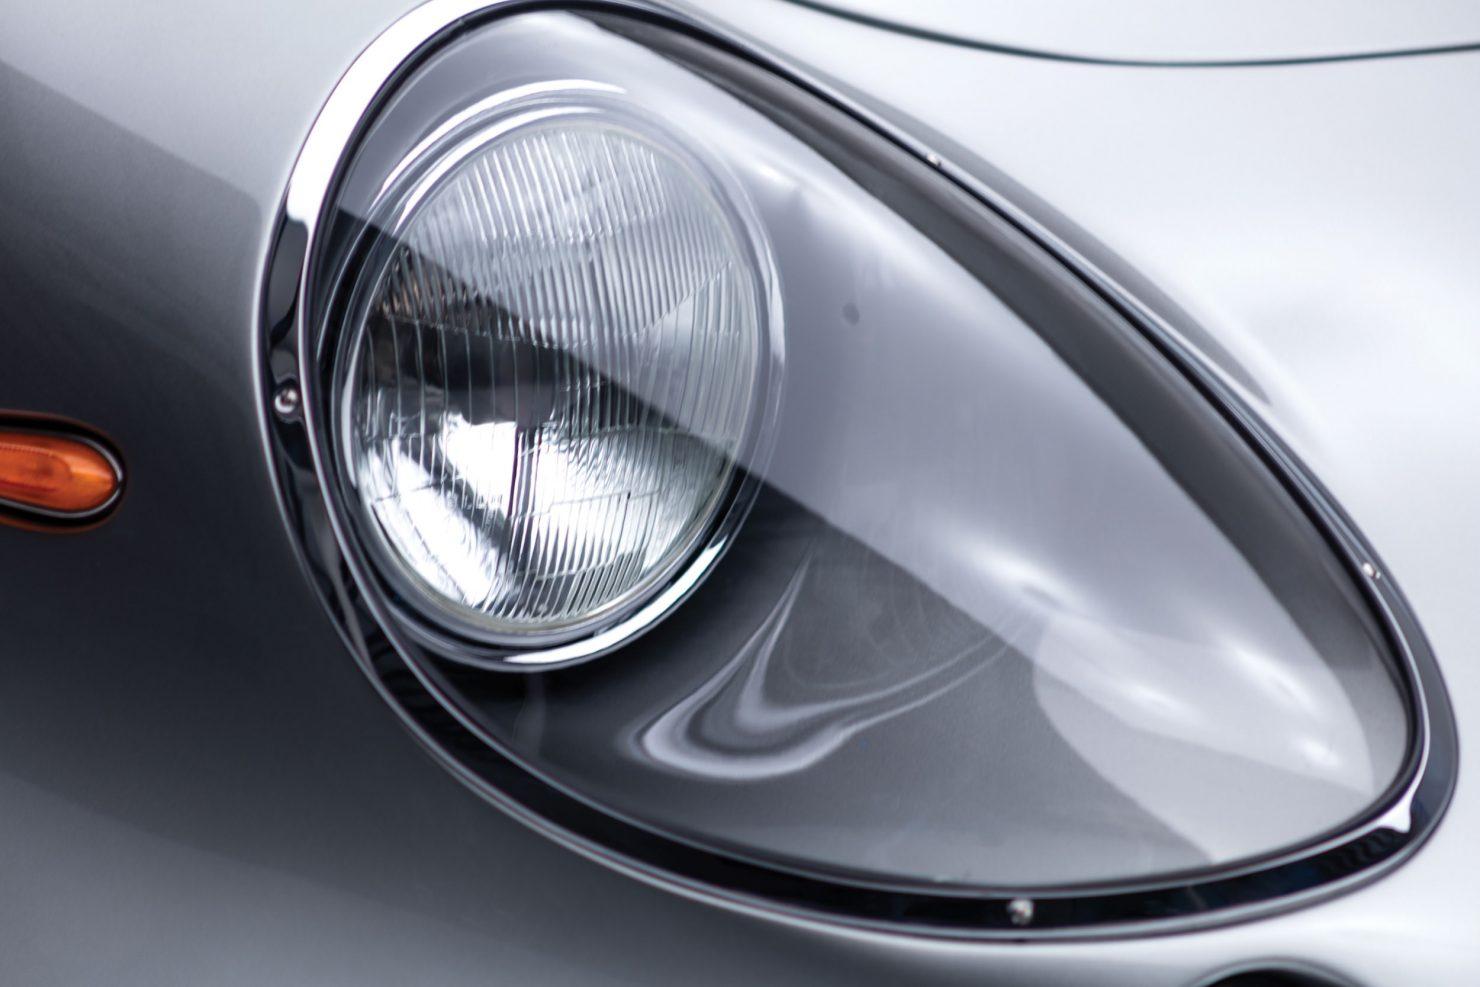 ferrari 275 gtb car 8 1480x987 - 1965 Ferrari 275 GTB/6C Alloy